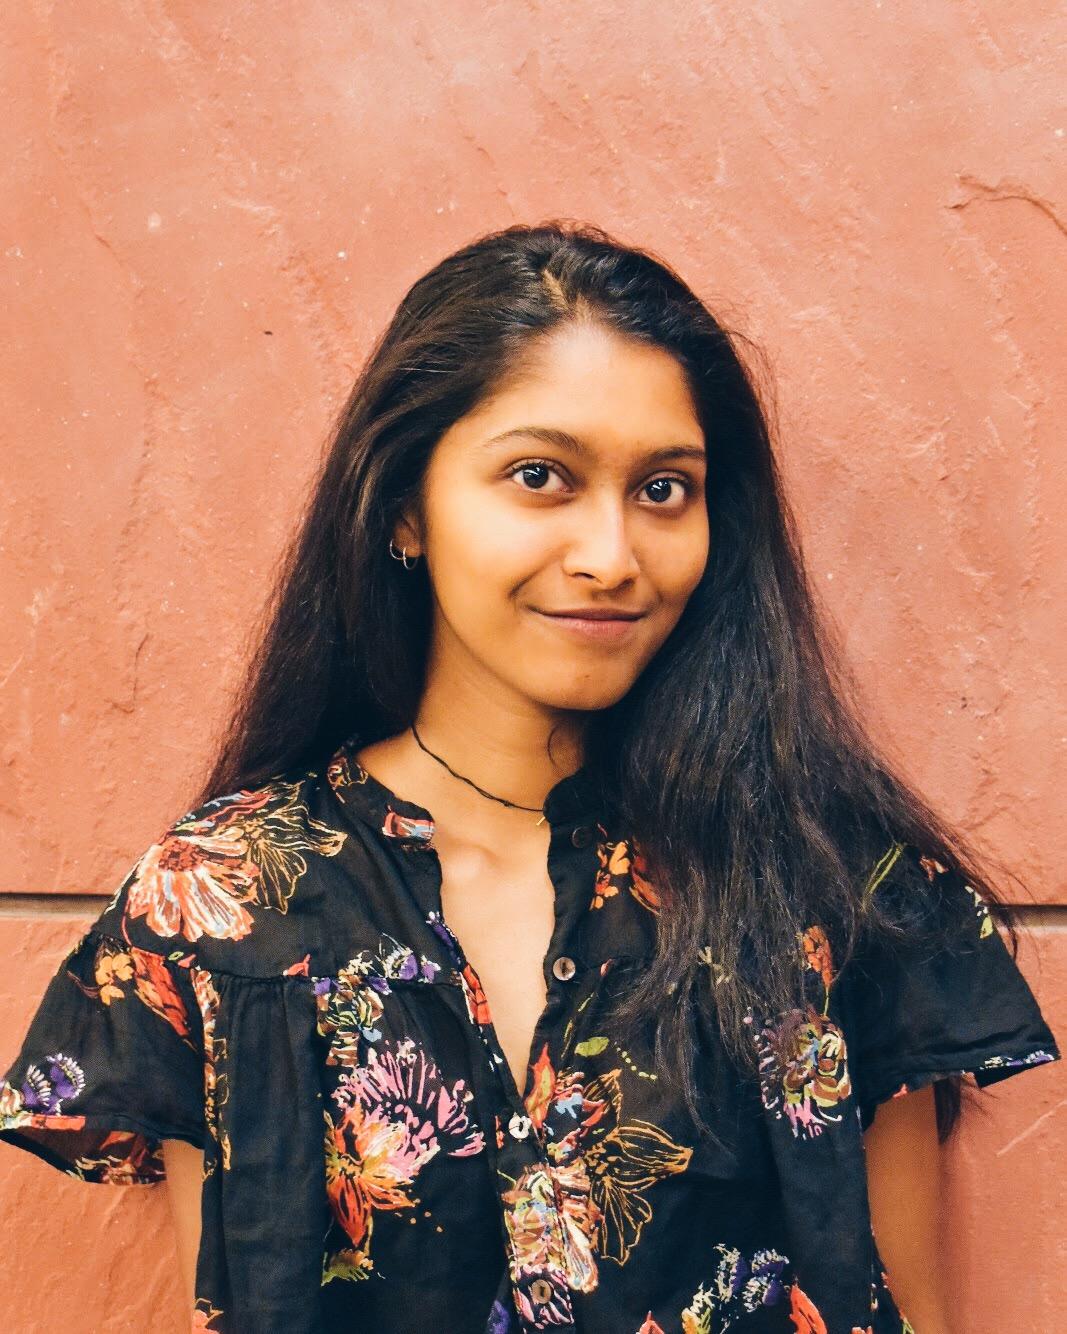 Sanjana Rao, Director of Web Development